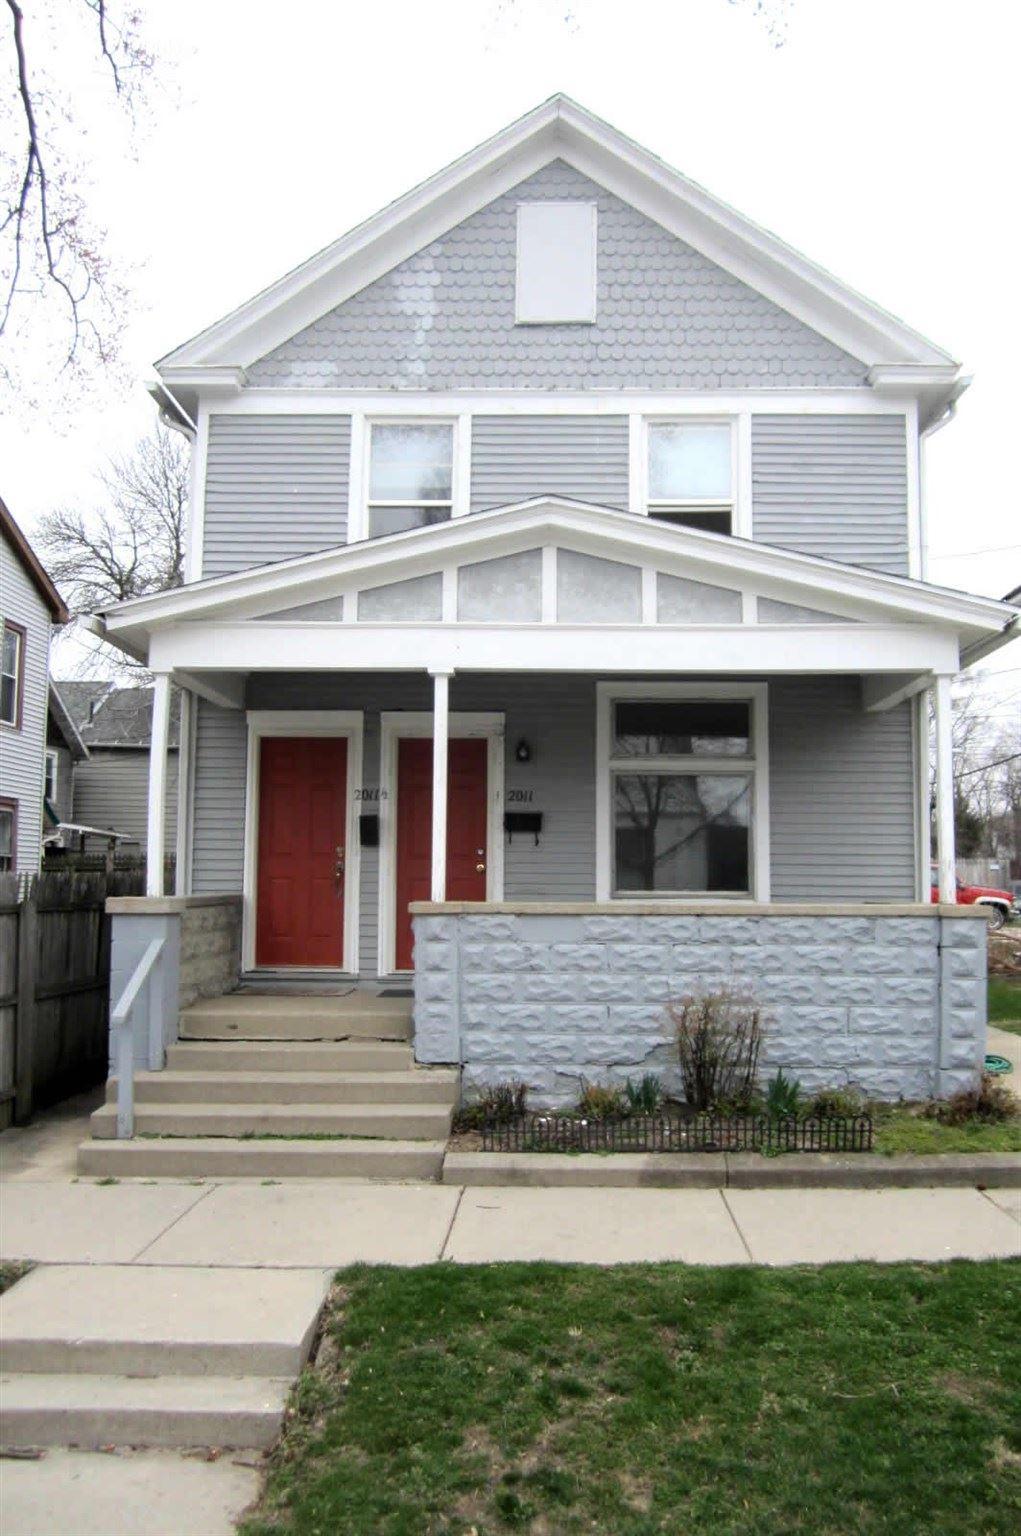 2011 Hoagland Avenue, Fort Wayne, IN 46802 - #: 202025711